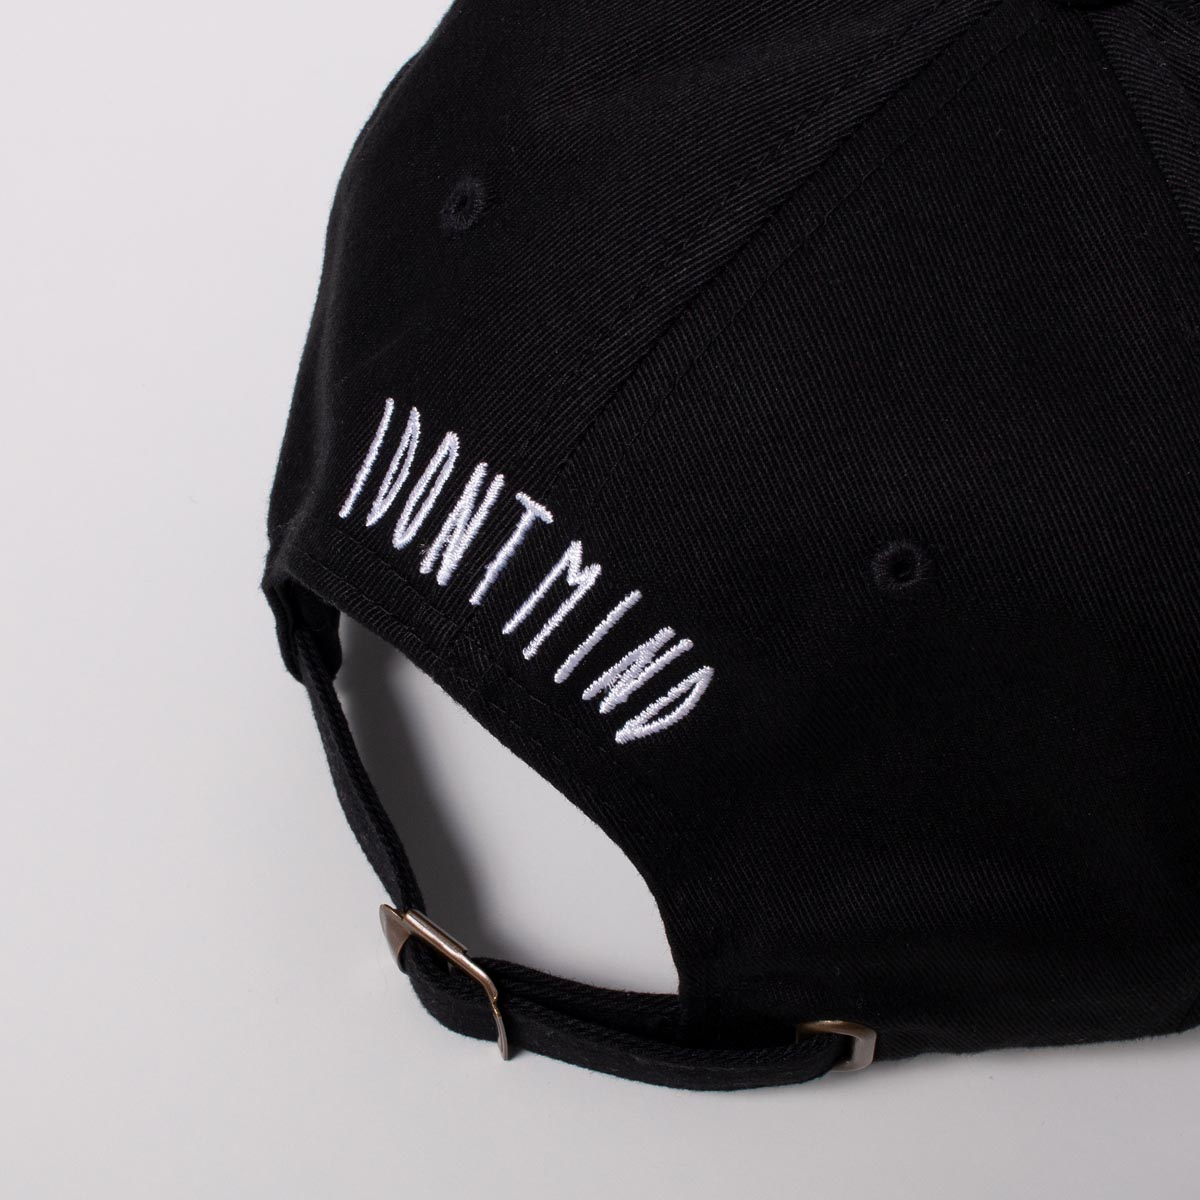 IDONTMIND-Outline-Hat-Back.jpg